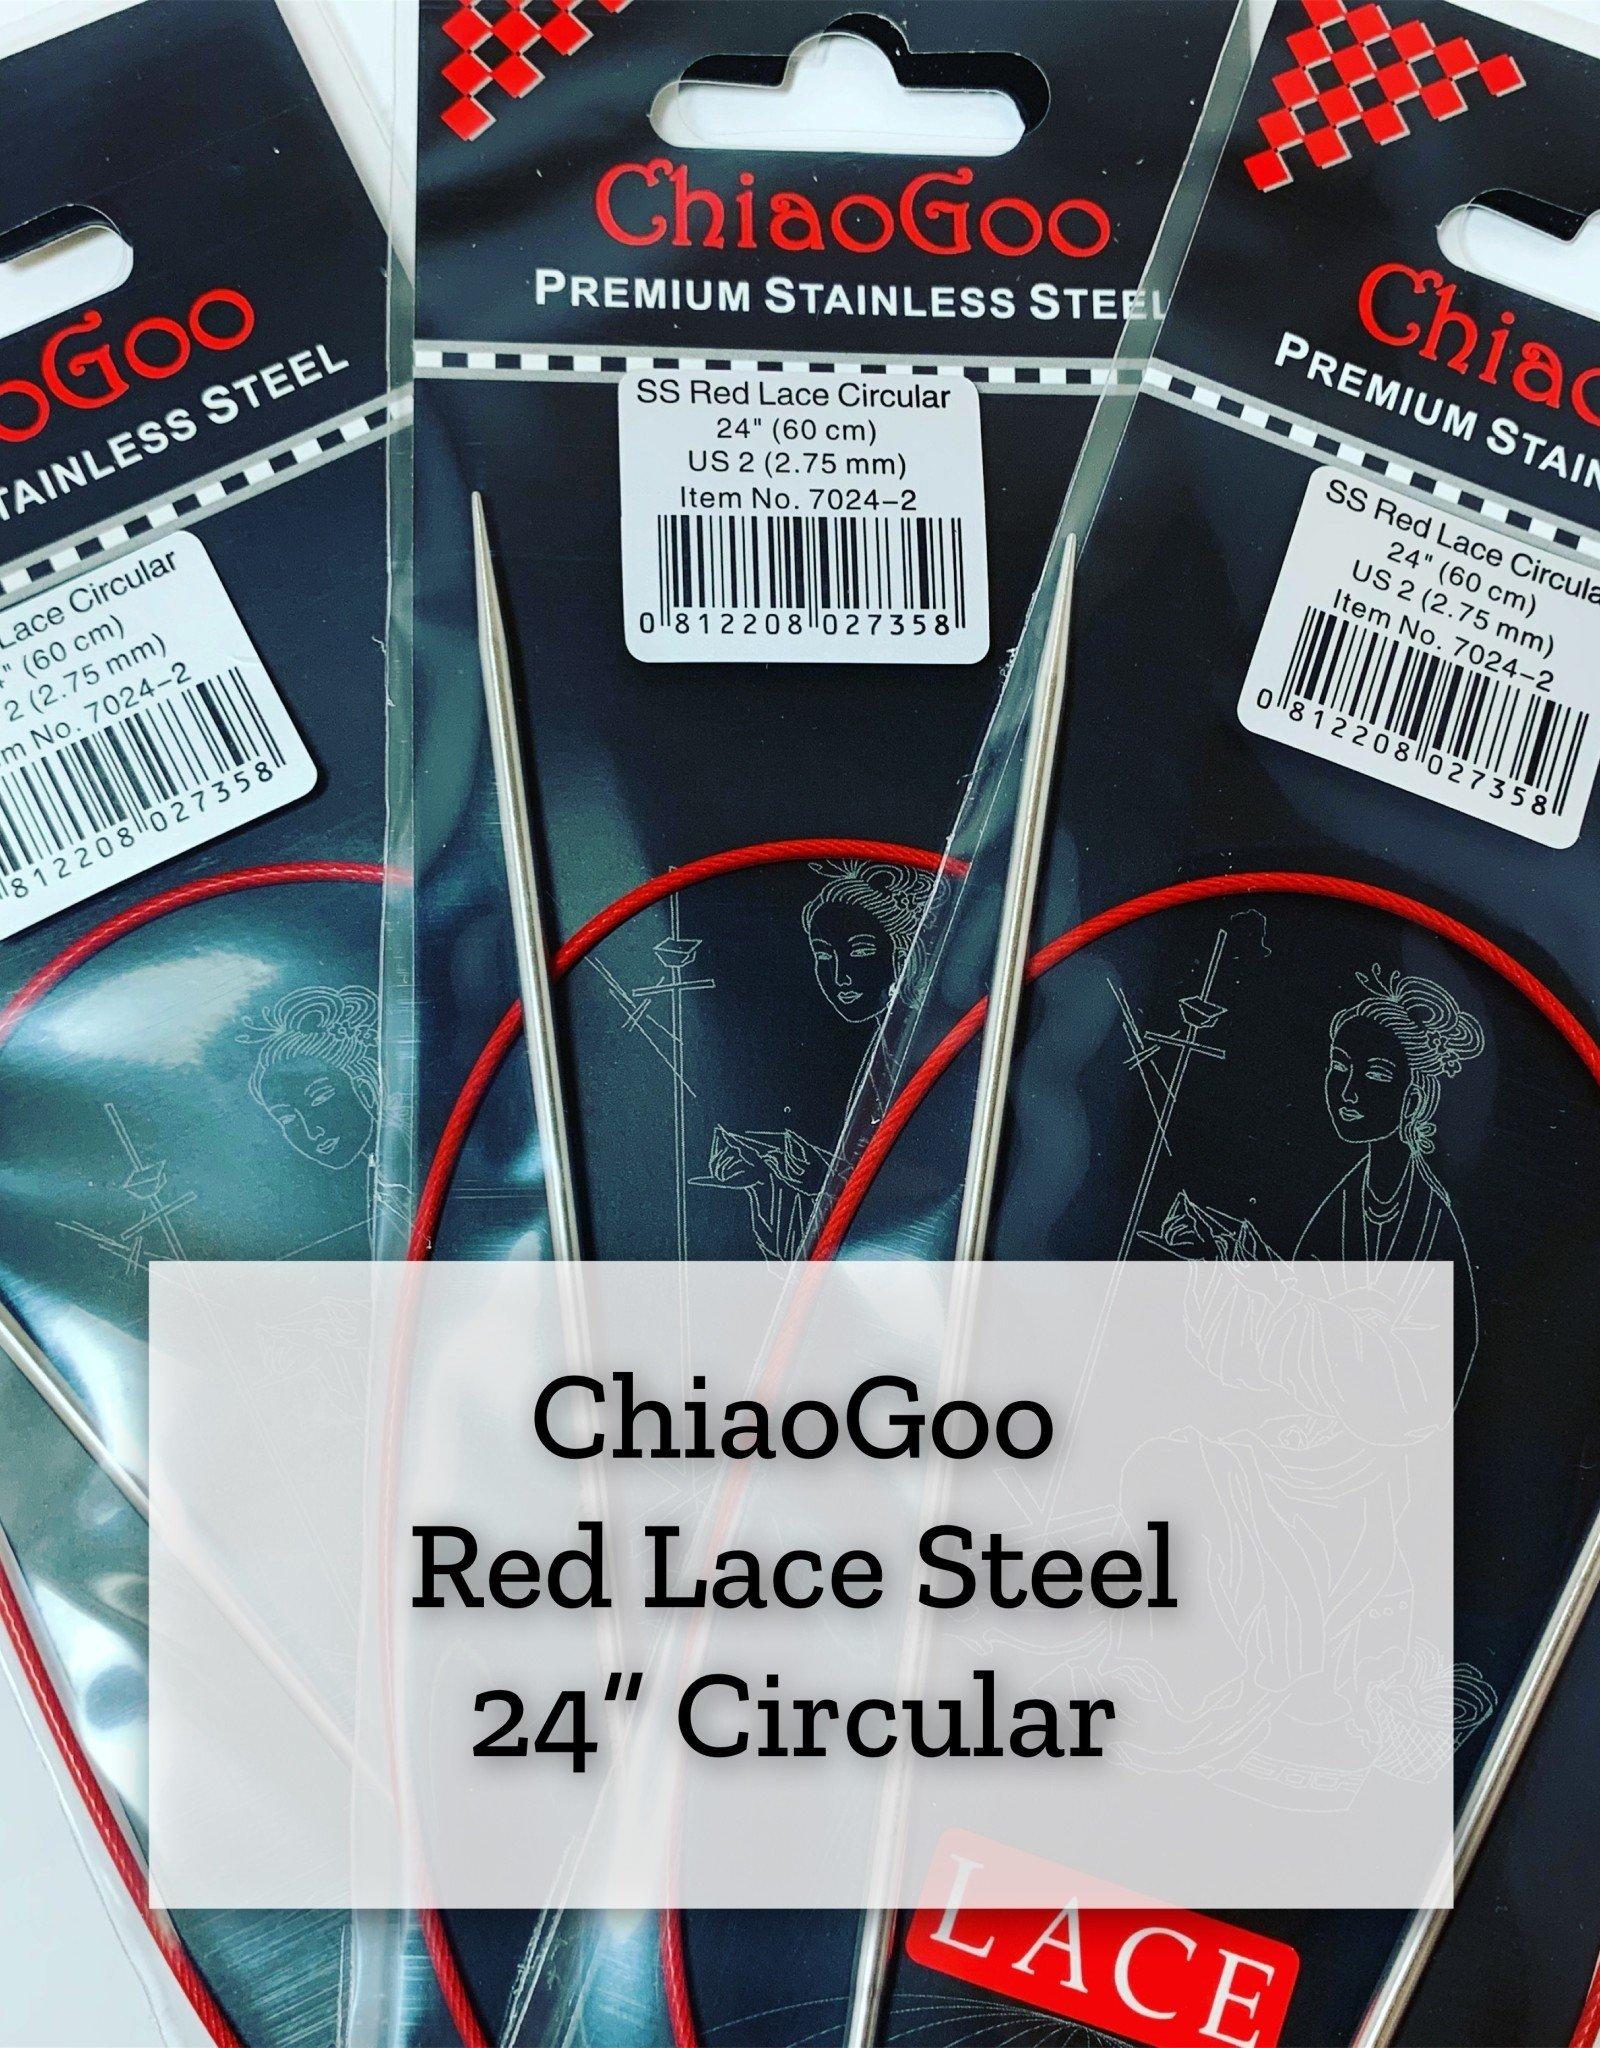 "ChiaoGoo Red Lace Steel - 24"" 3.5 mm"